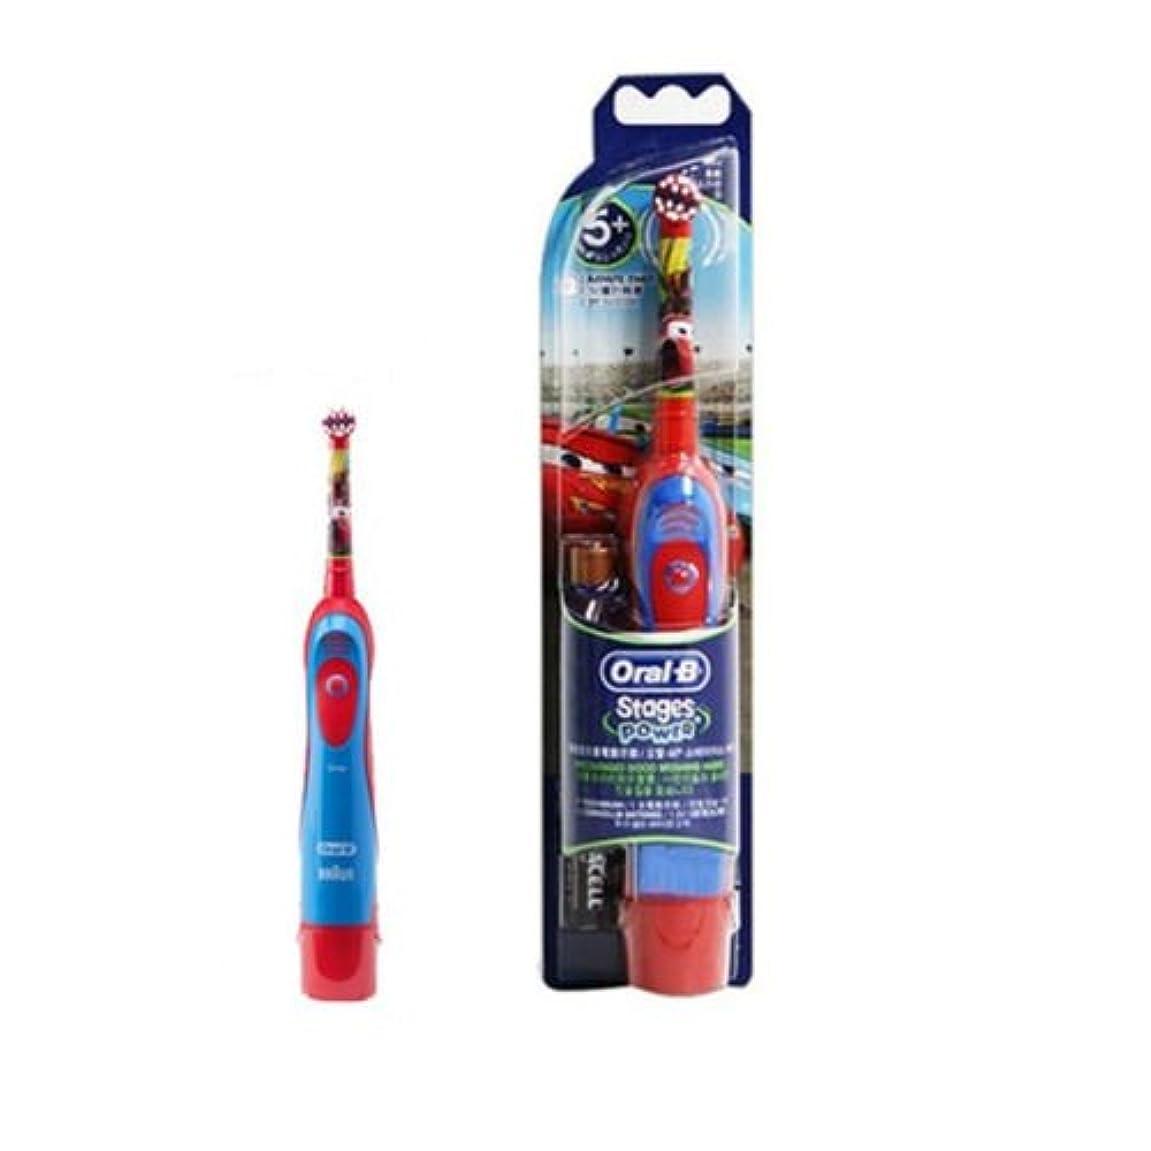 審判害定期的なBraun Oral-B D2 D2010 Disney Car Kids 電動歯ブラシ [並行輸入品]